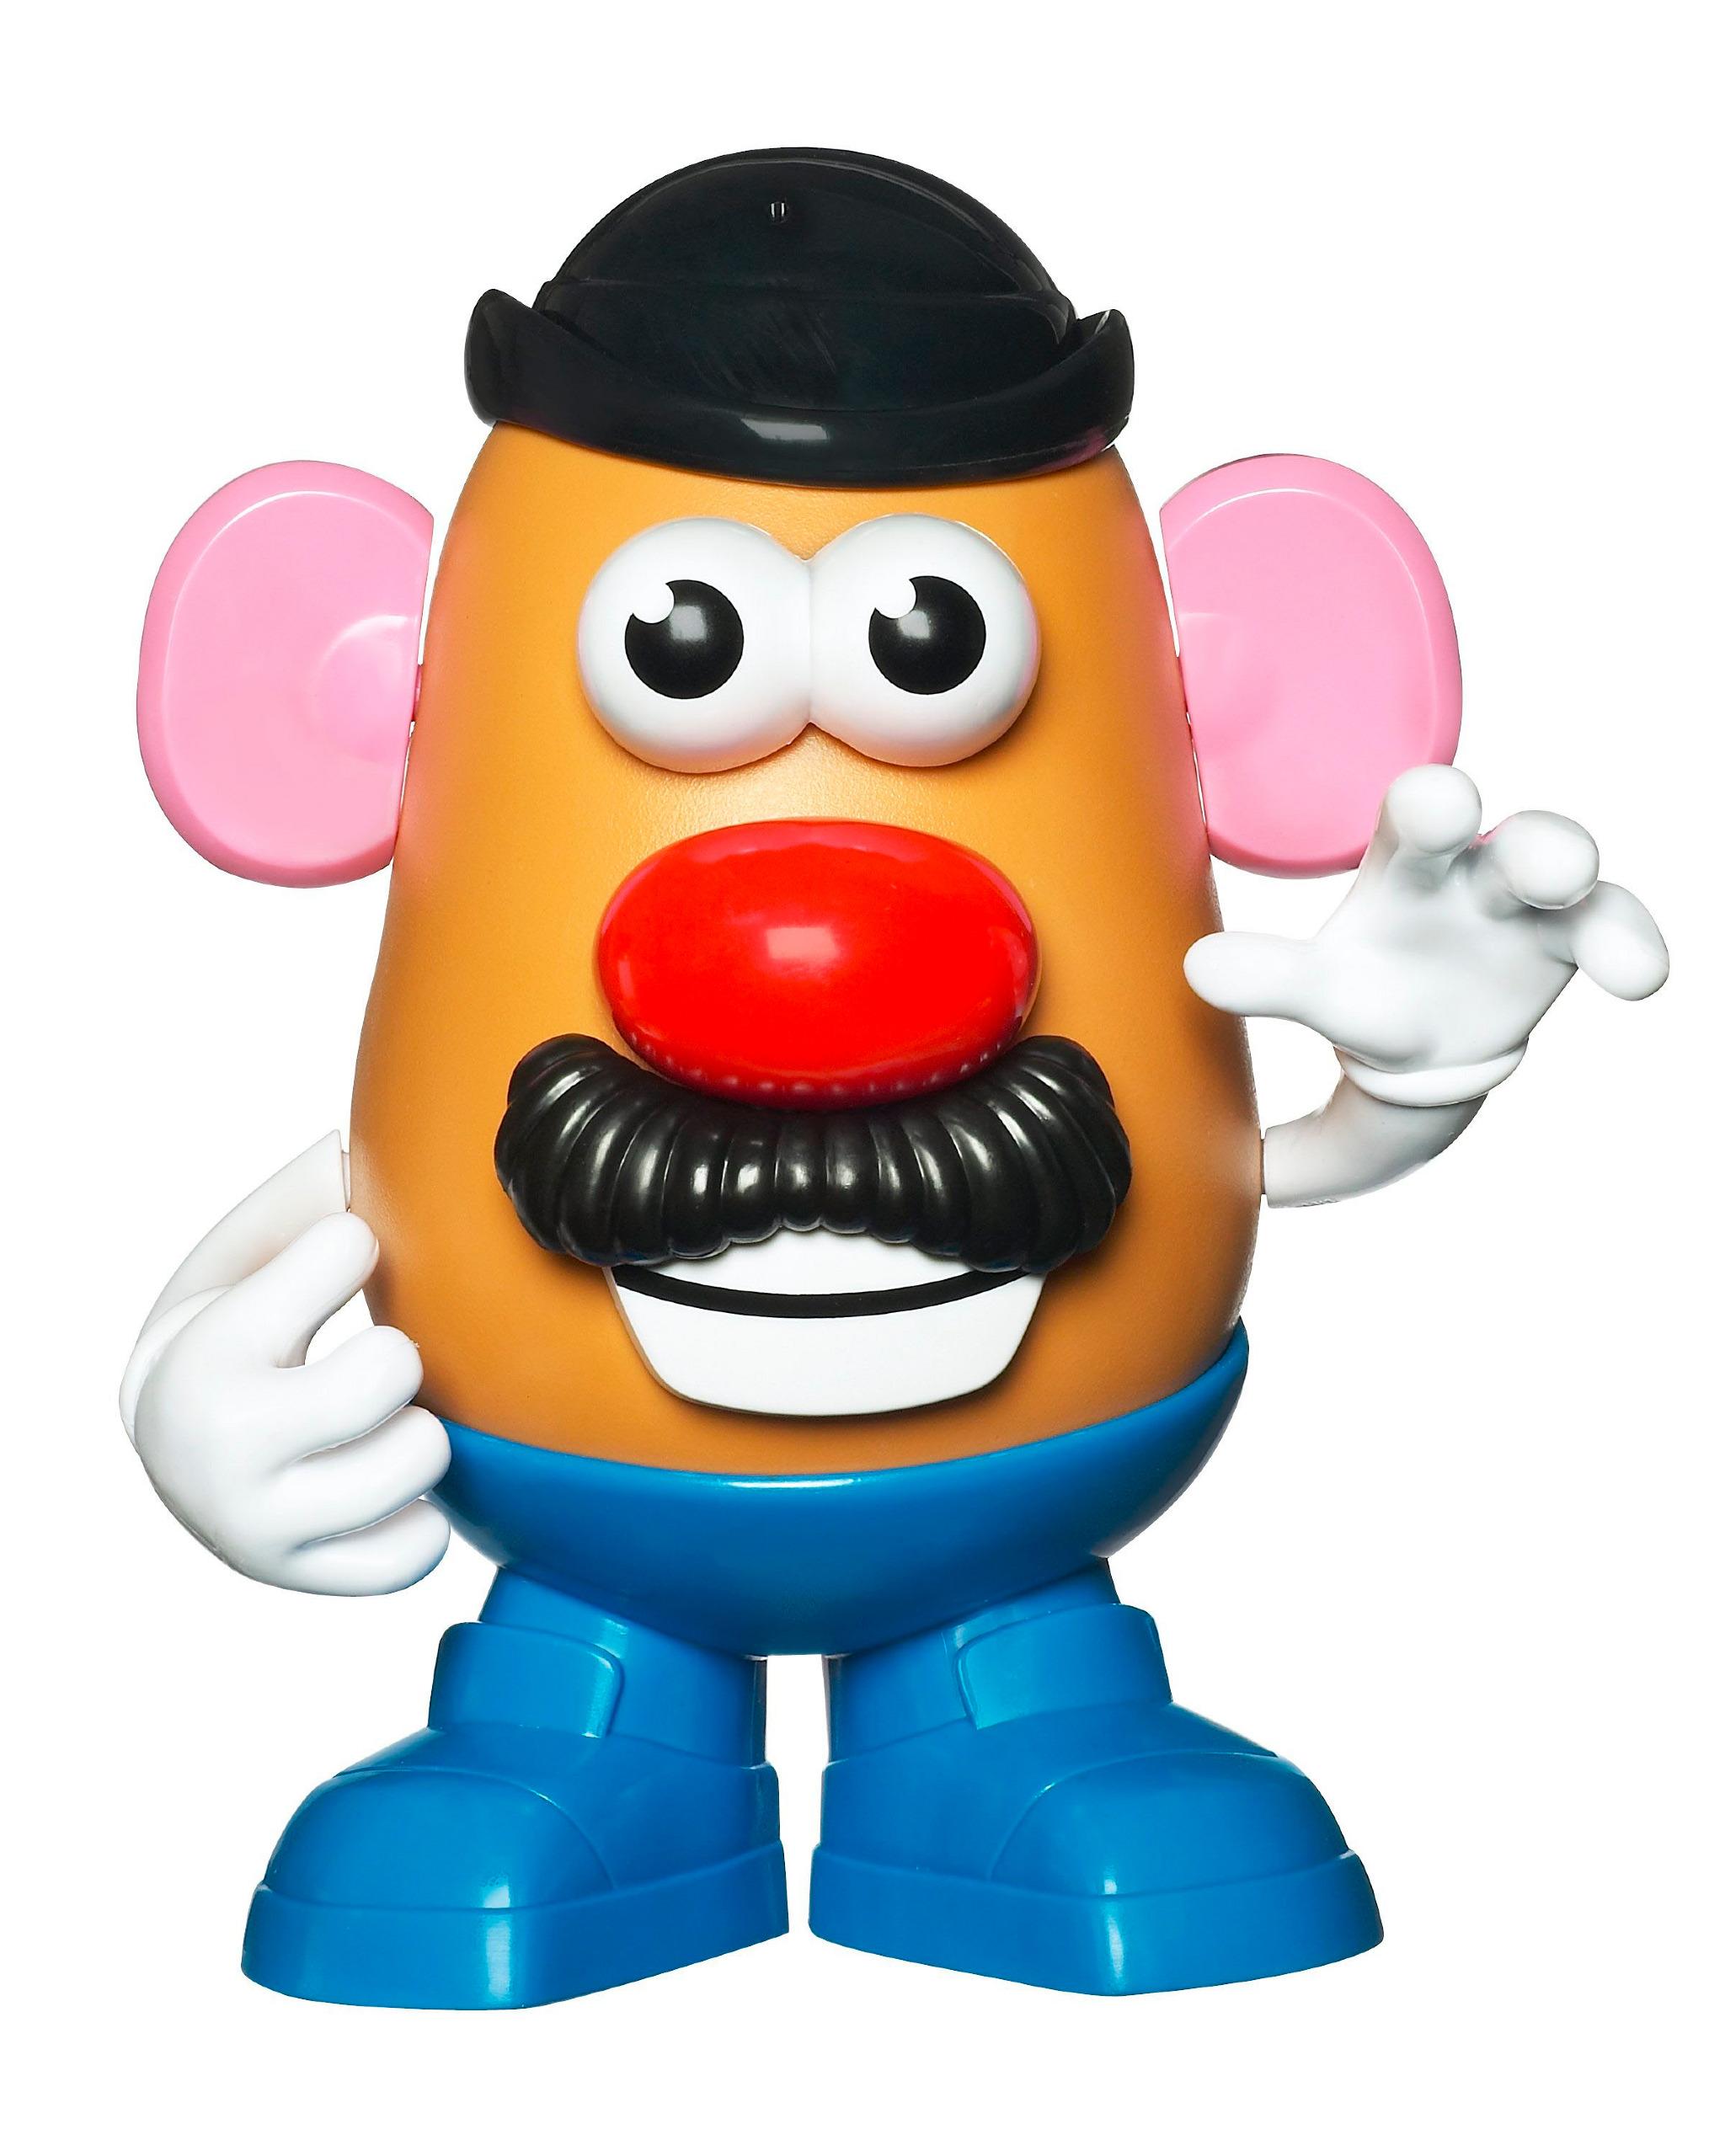 Mr-Mrs-Potato-Head-Hasbro-3.jpg